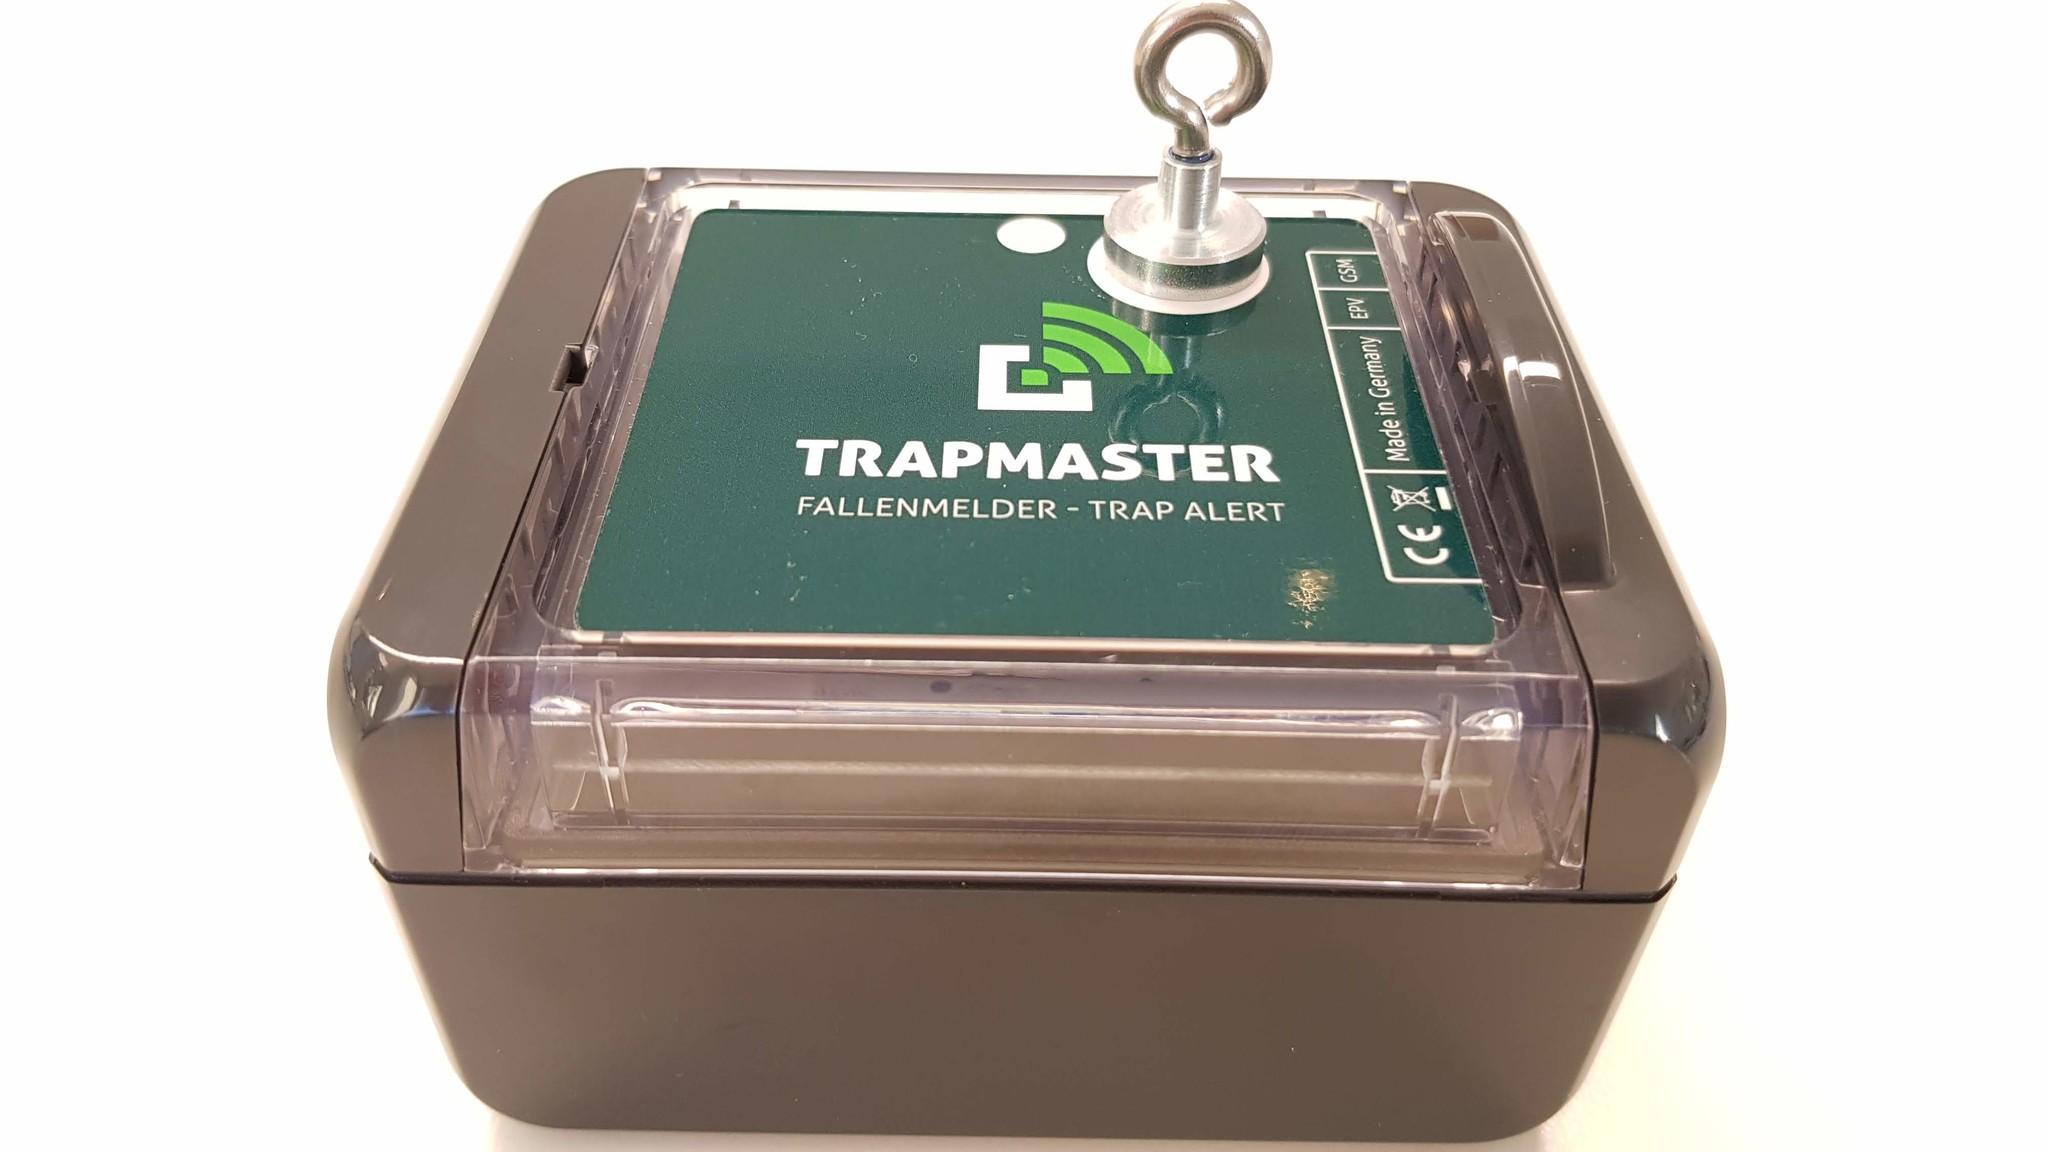 Trapmaster Ersatzmagnet